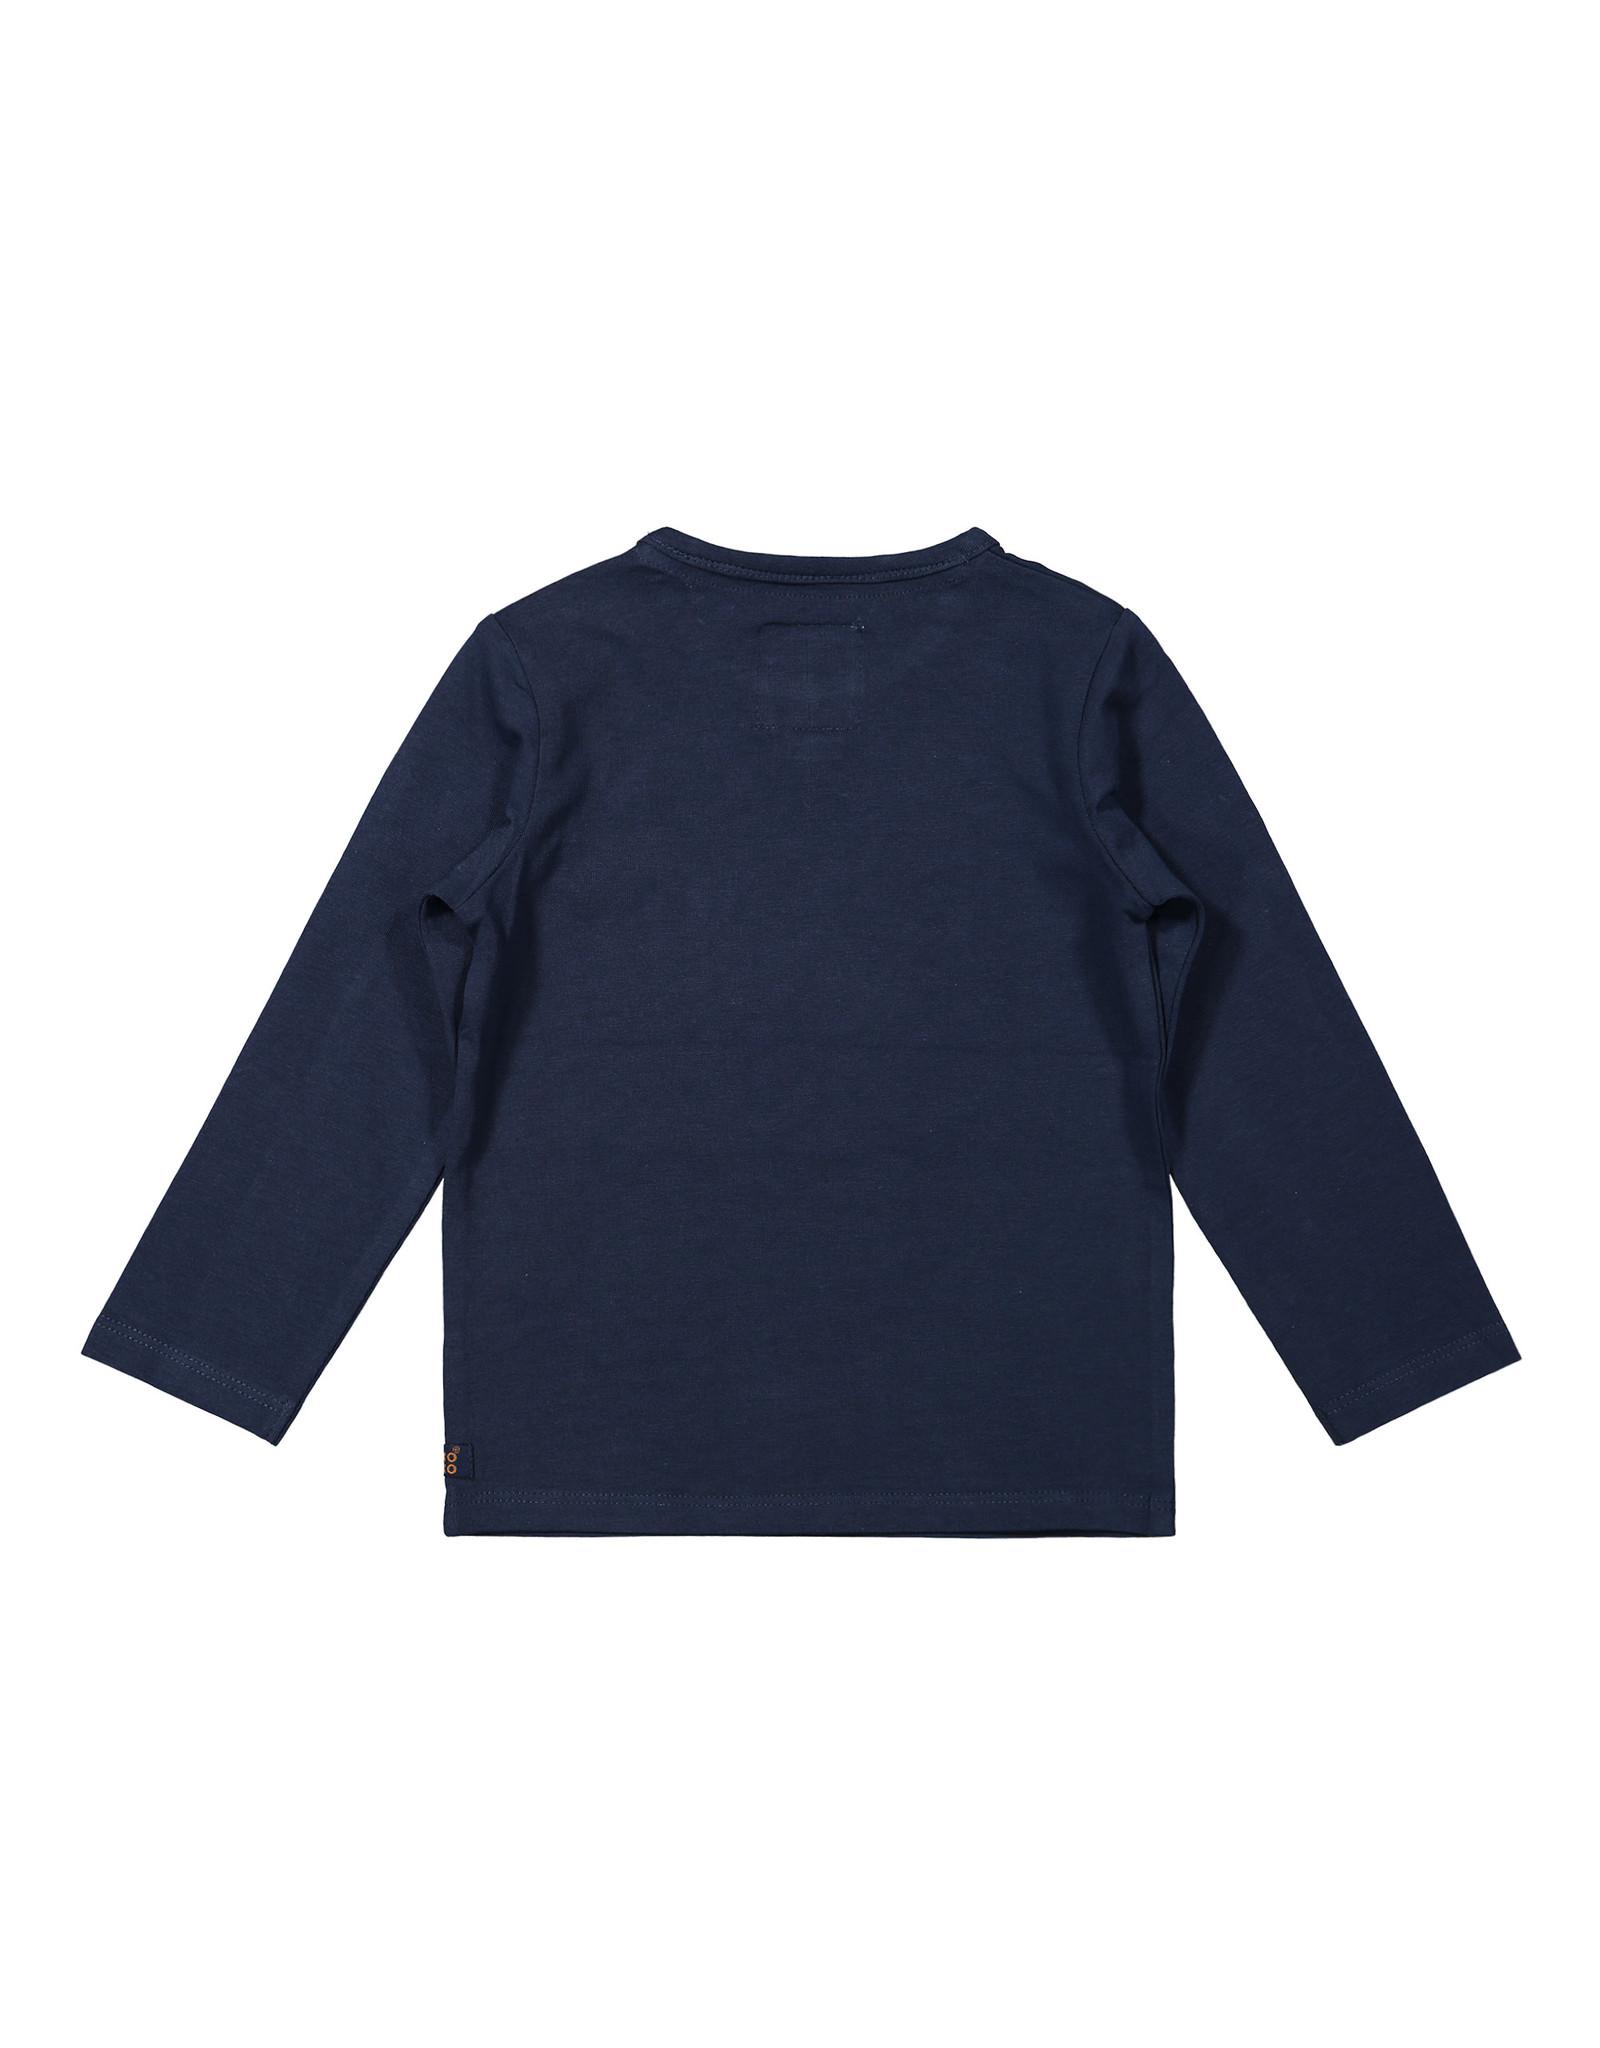 Koko Noko Koko Noko jongens shirt Branches Navy